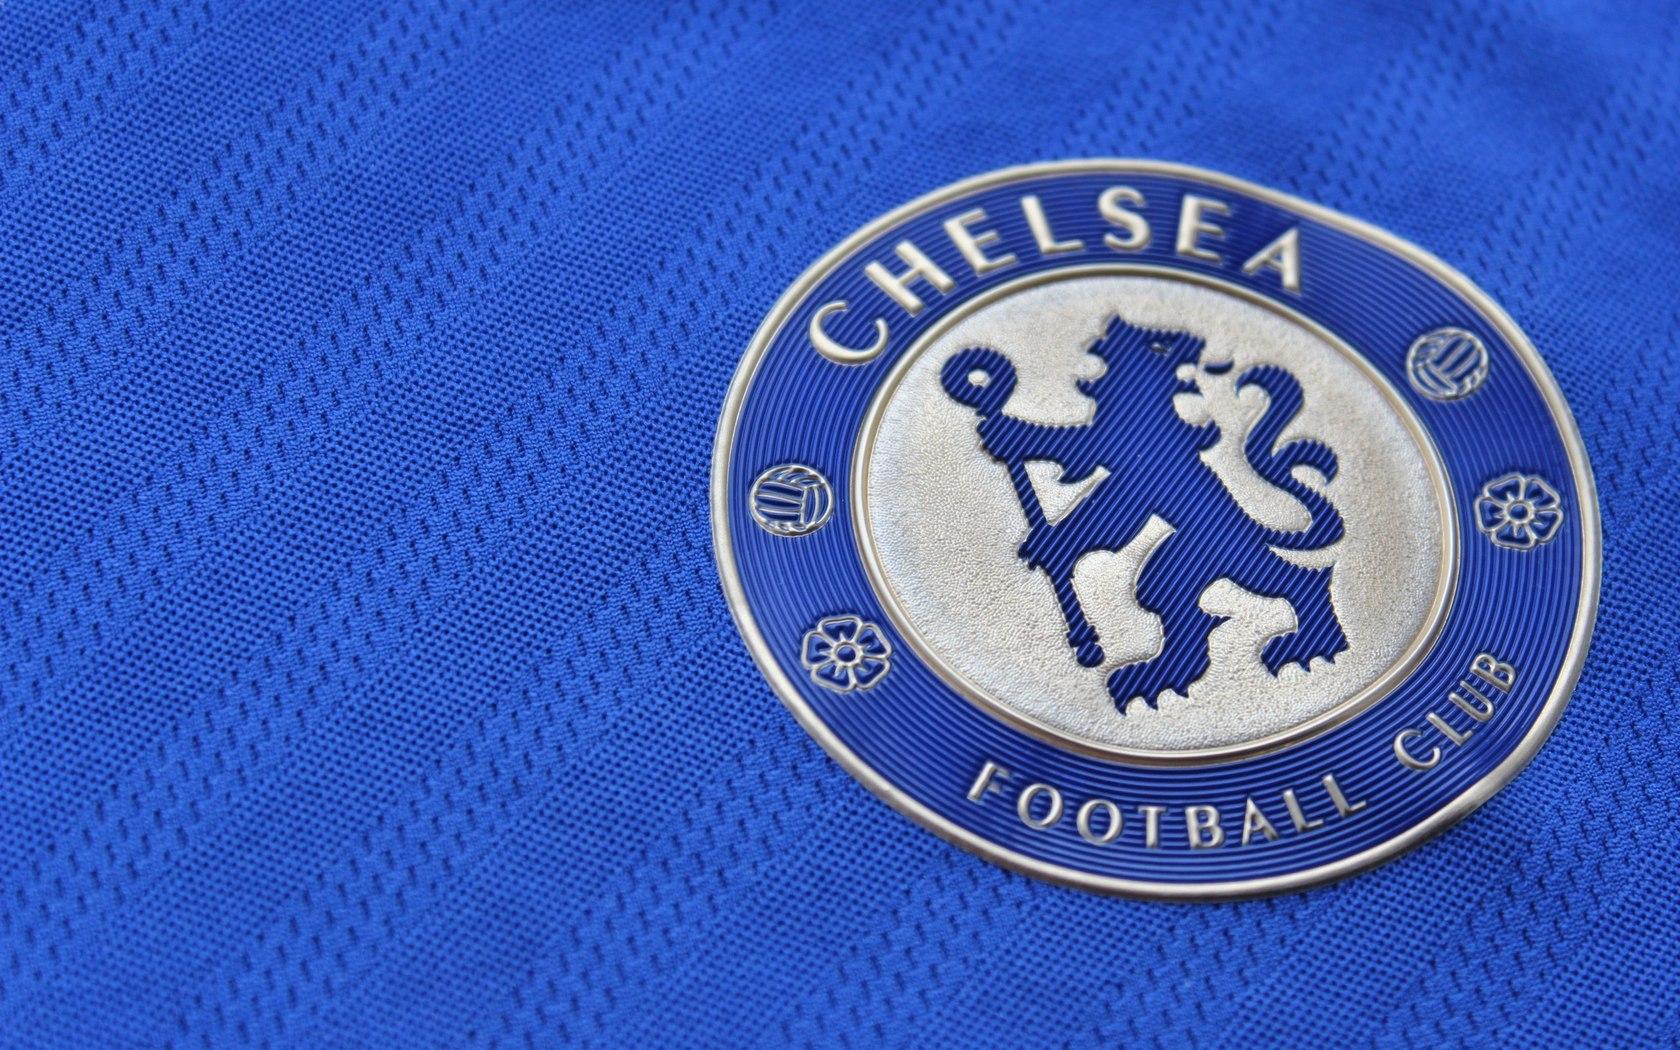 Chelsea Football Club 1680x1050 2060 HD Wallpaper Res 1680x1050